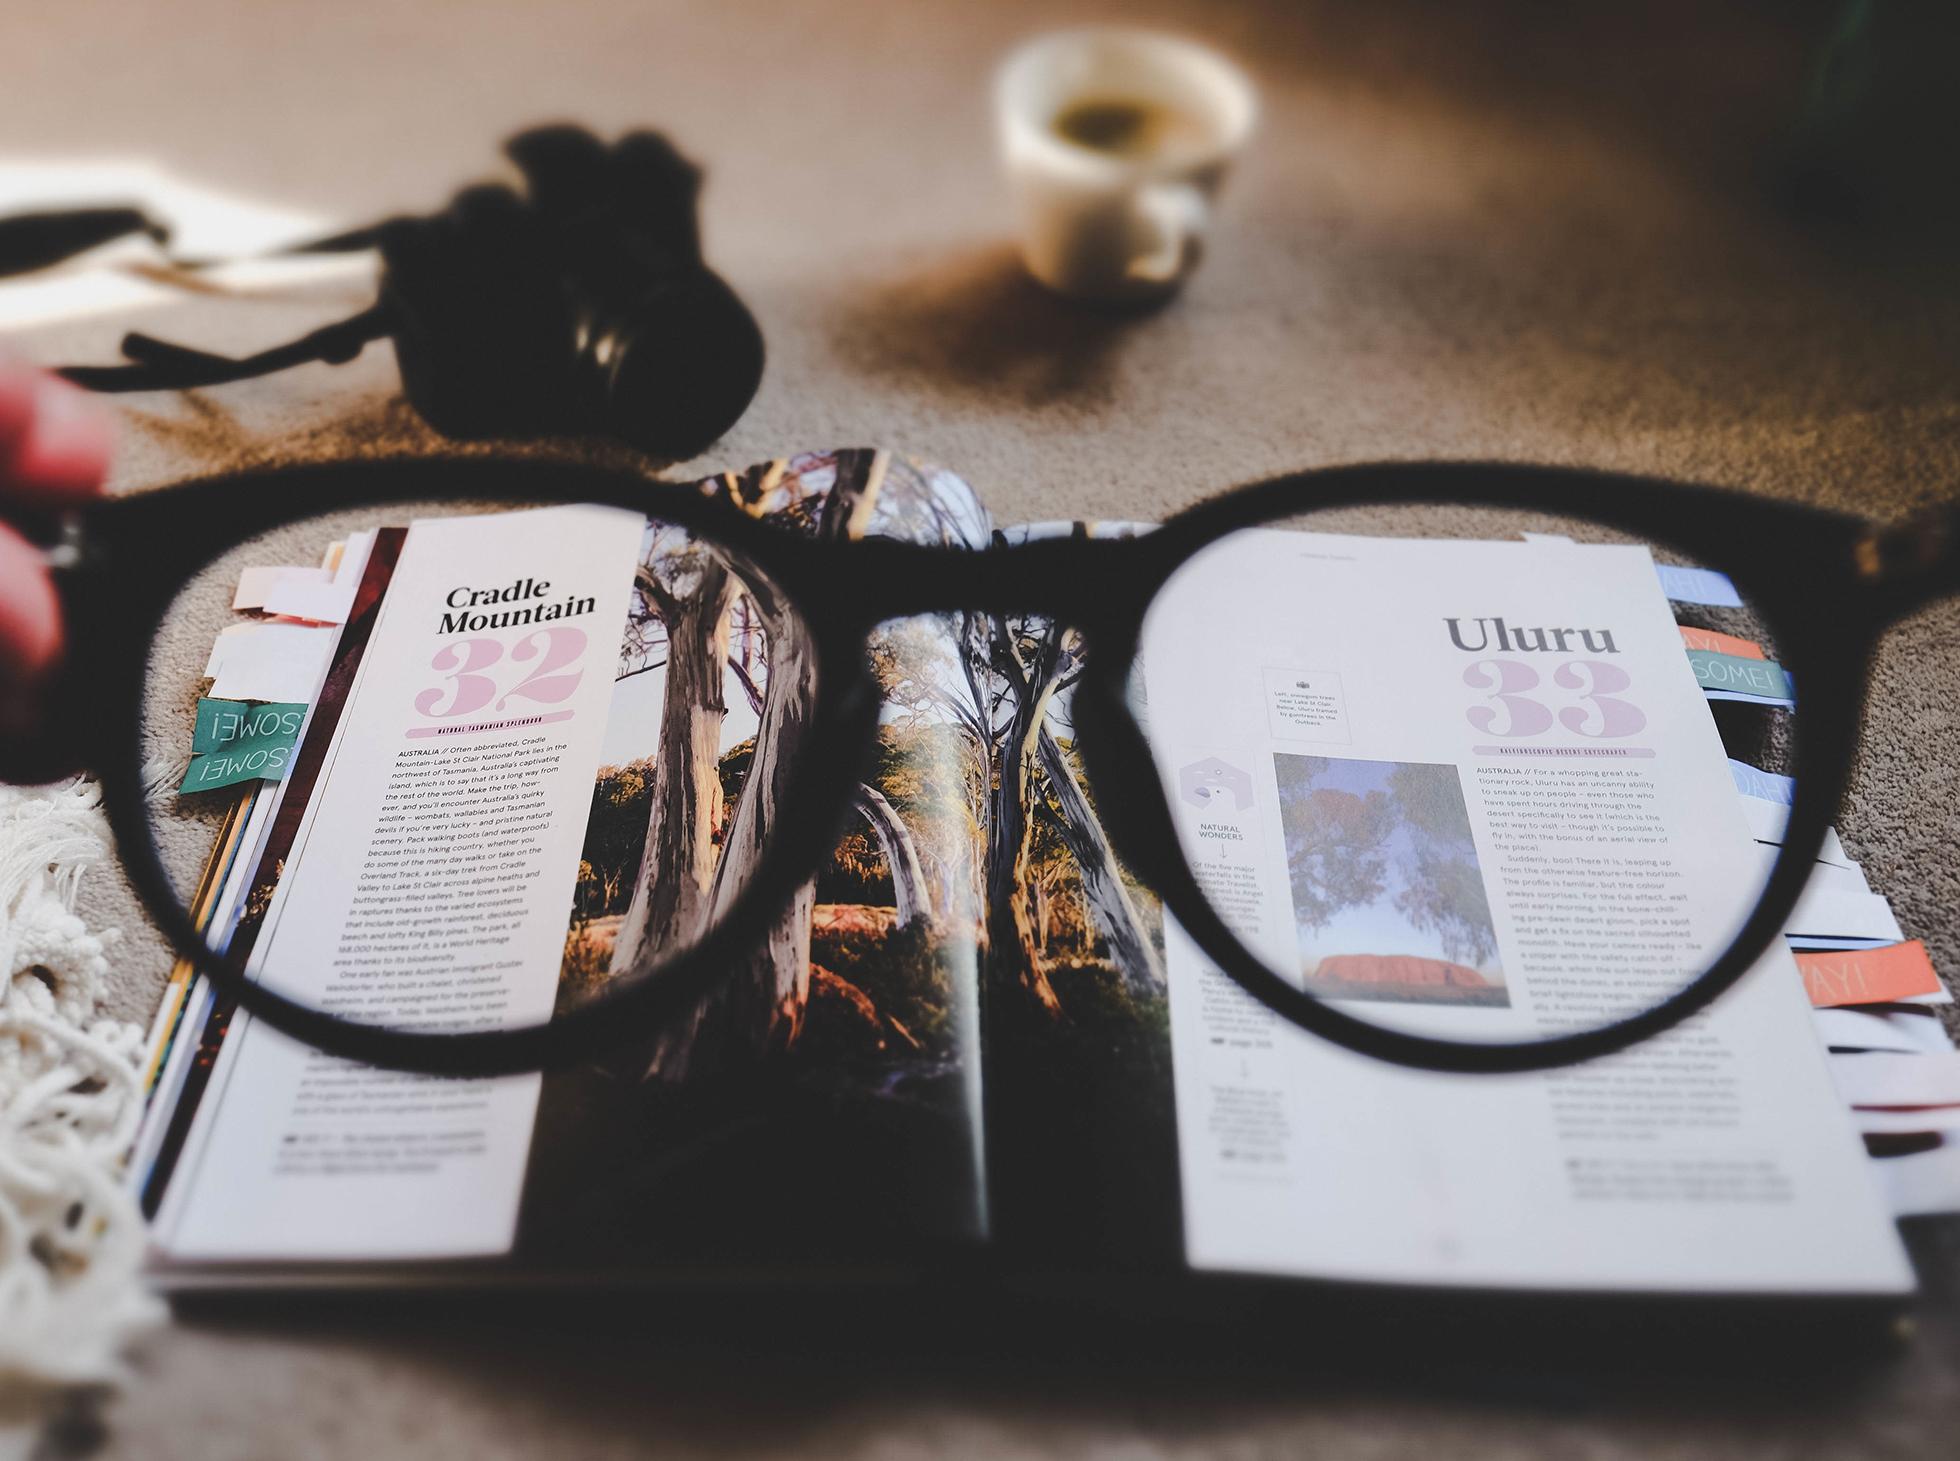 Share week blogi ktore polecam